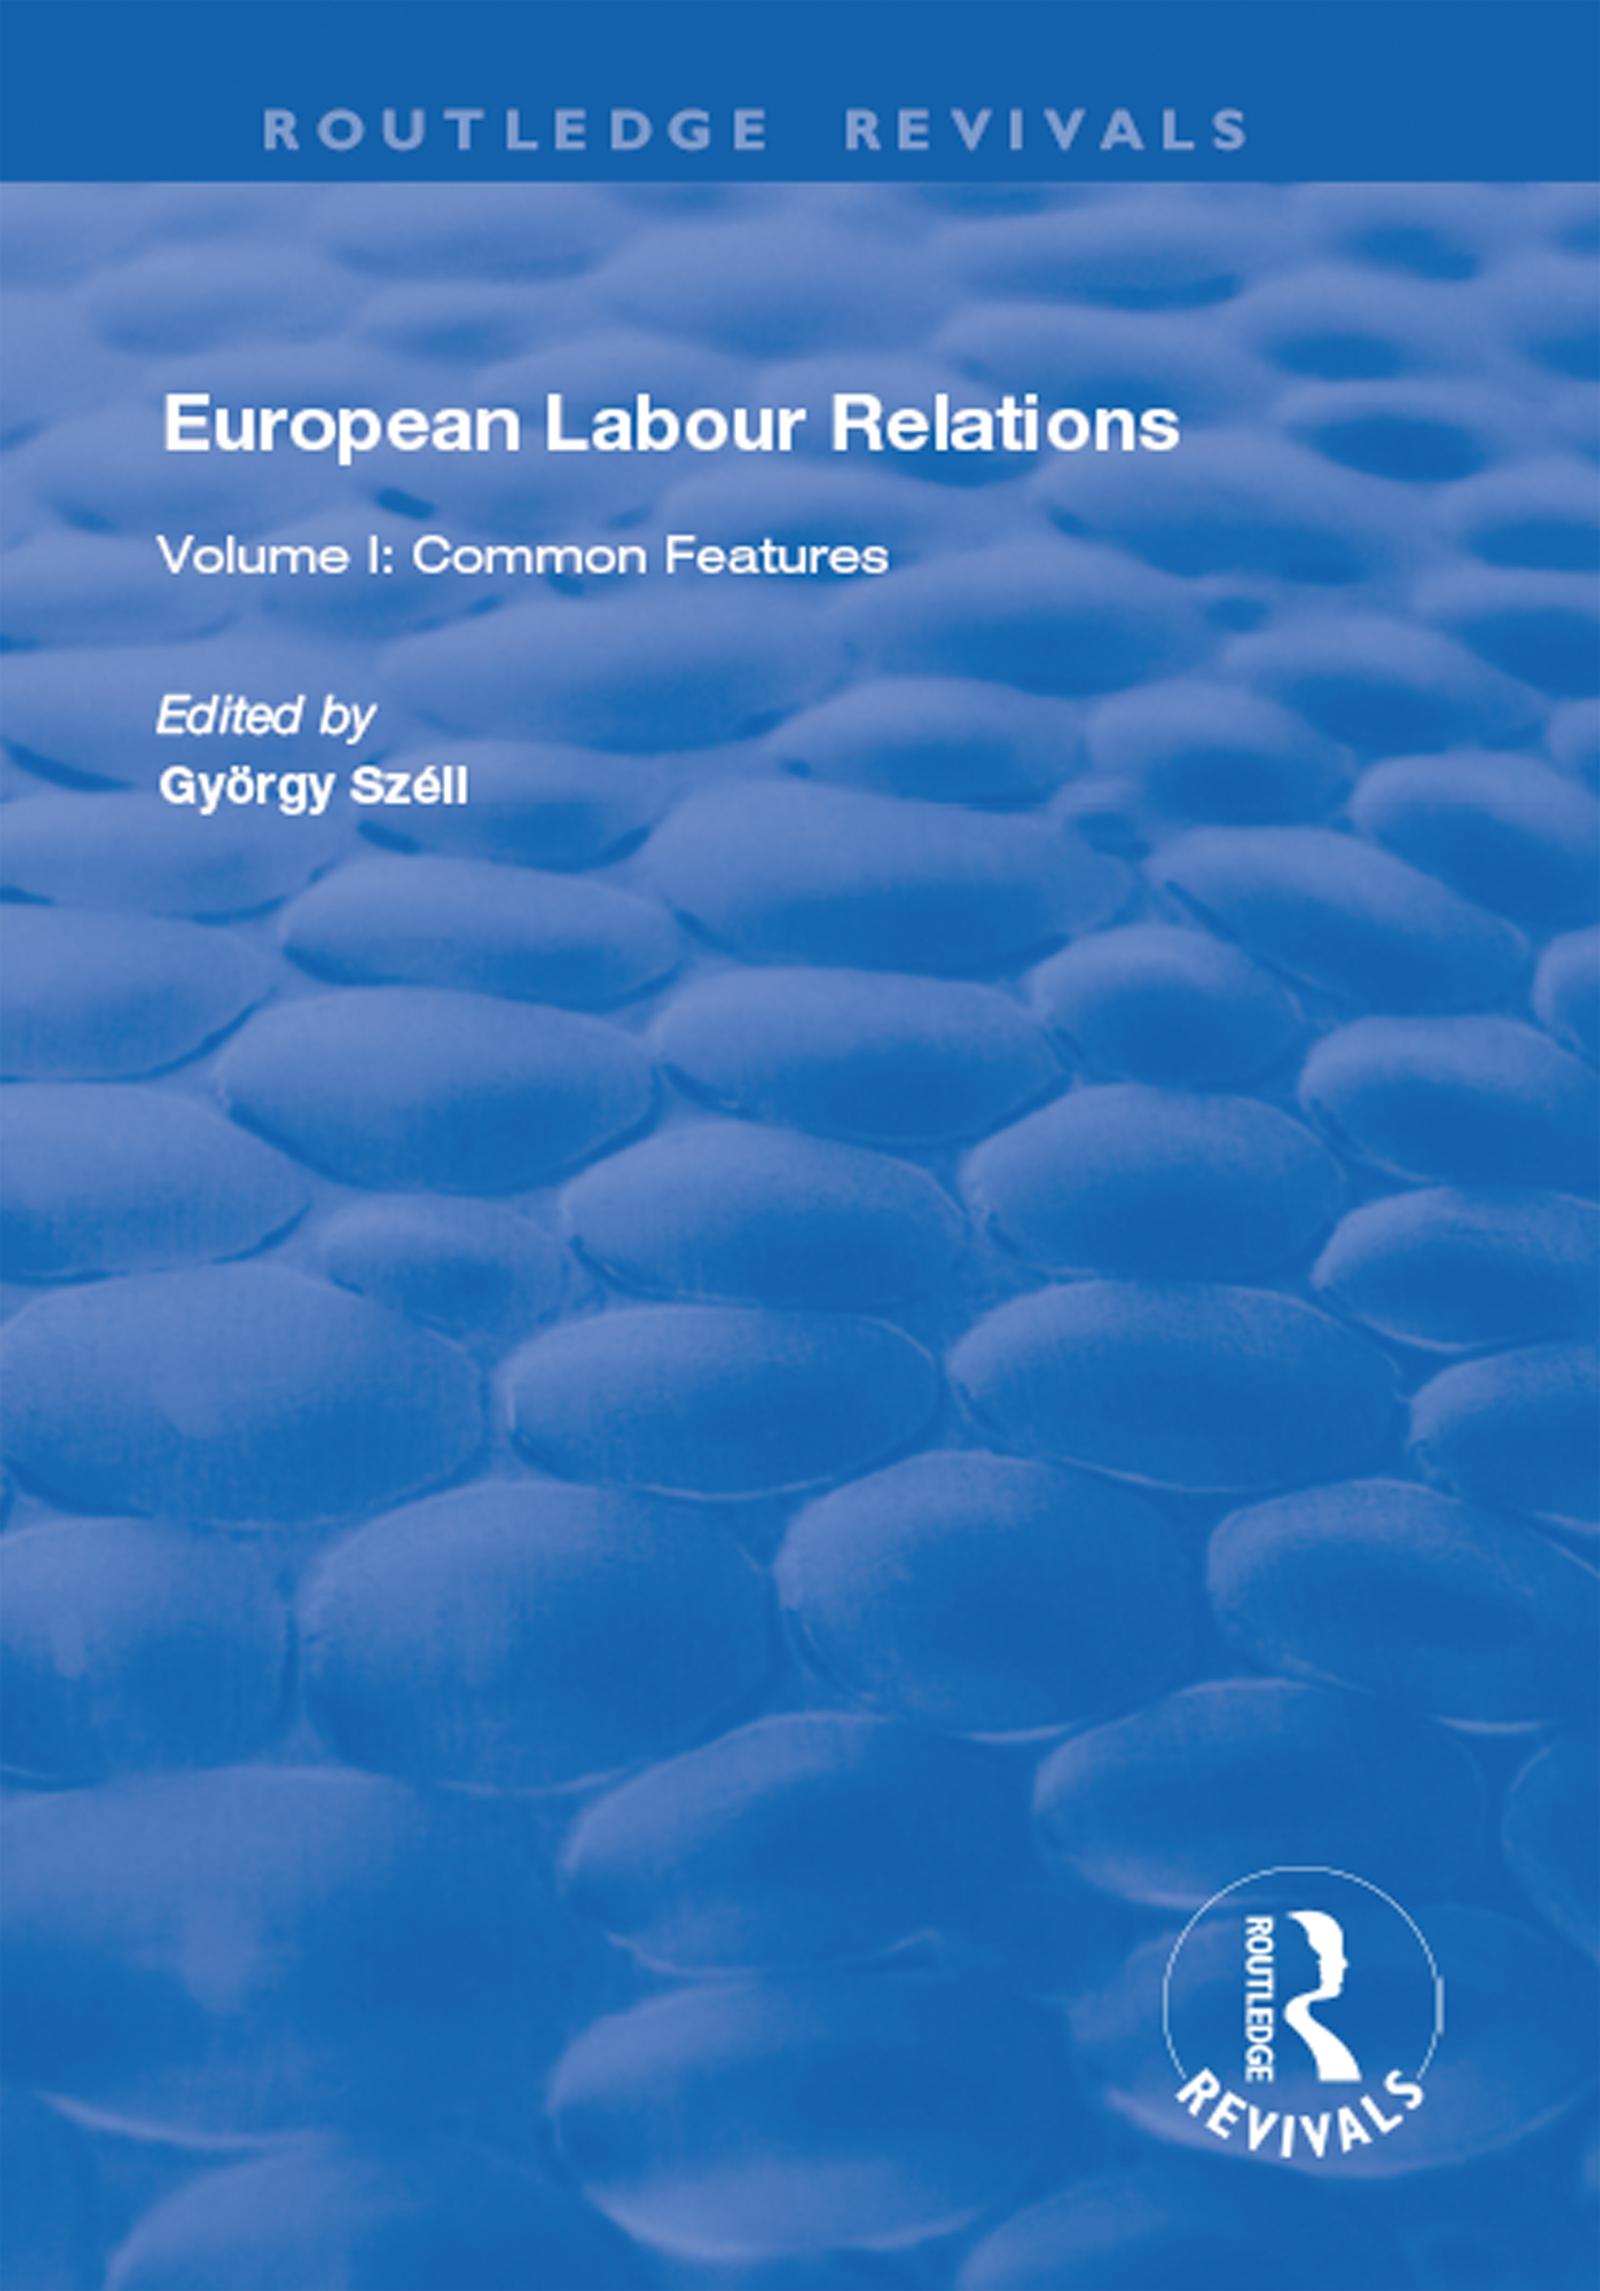 European Labour Relations